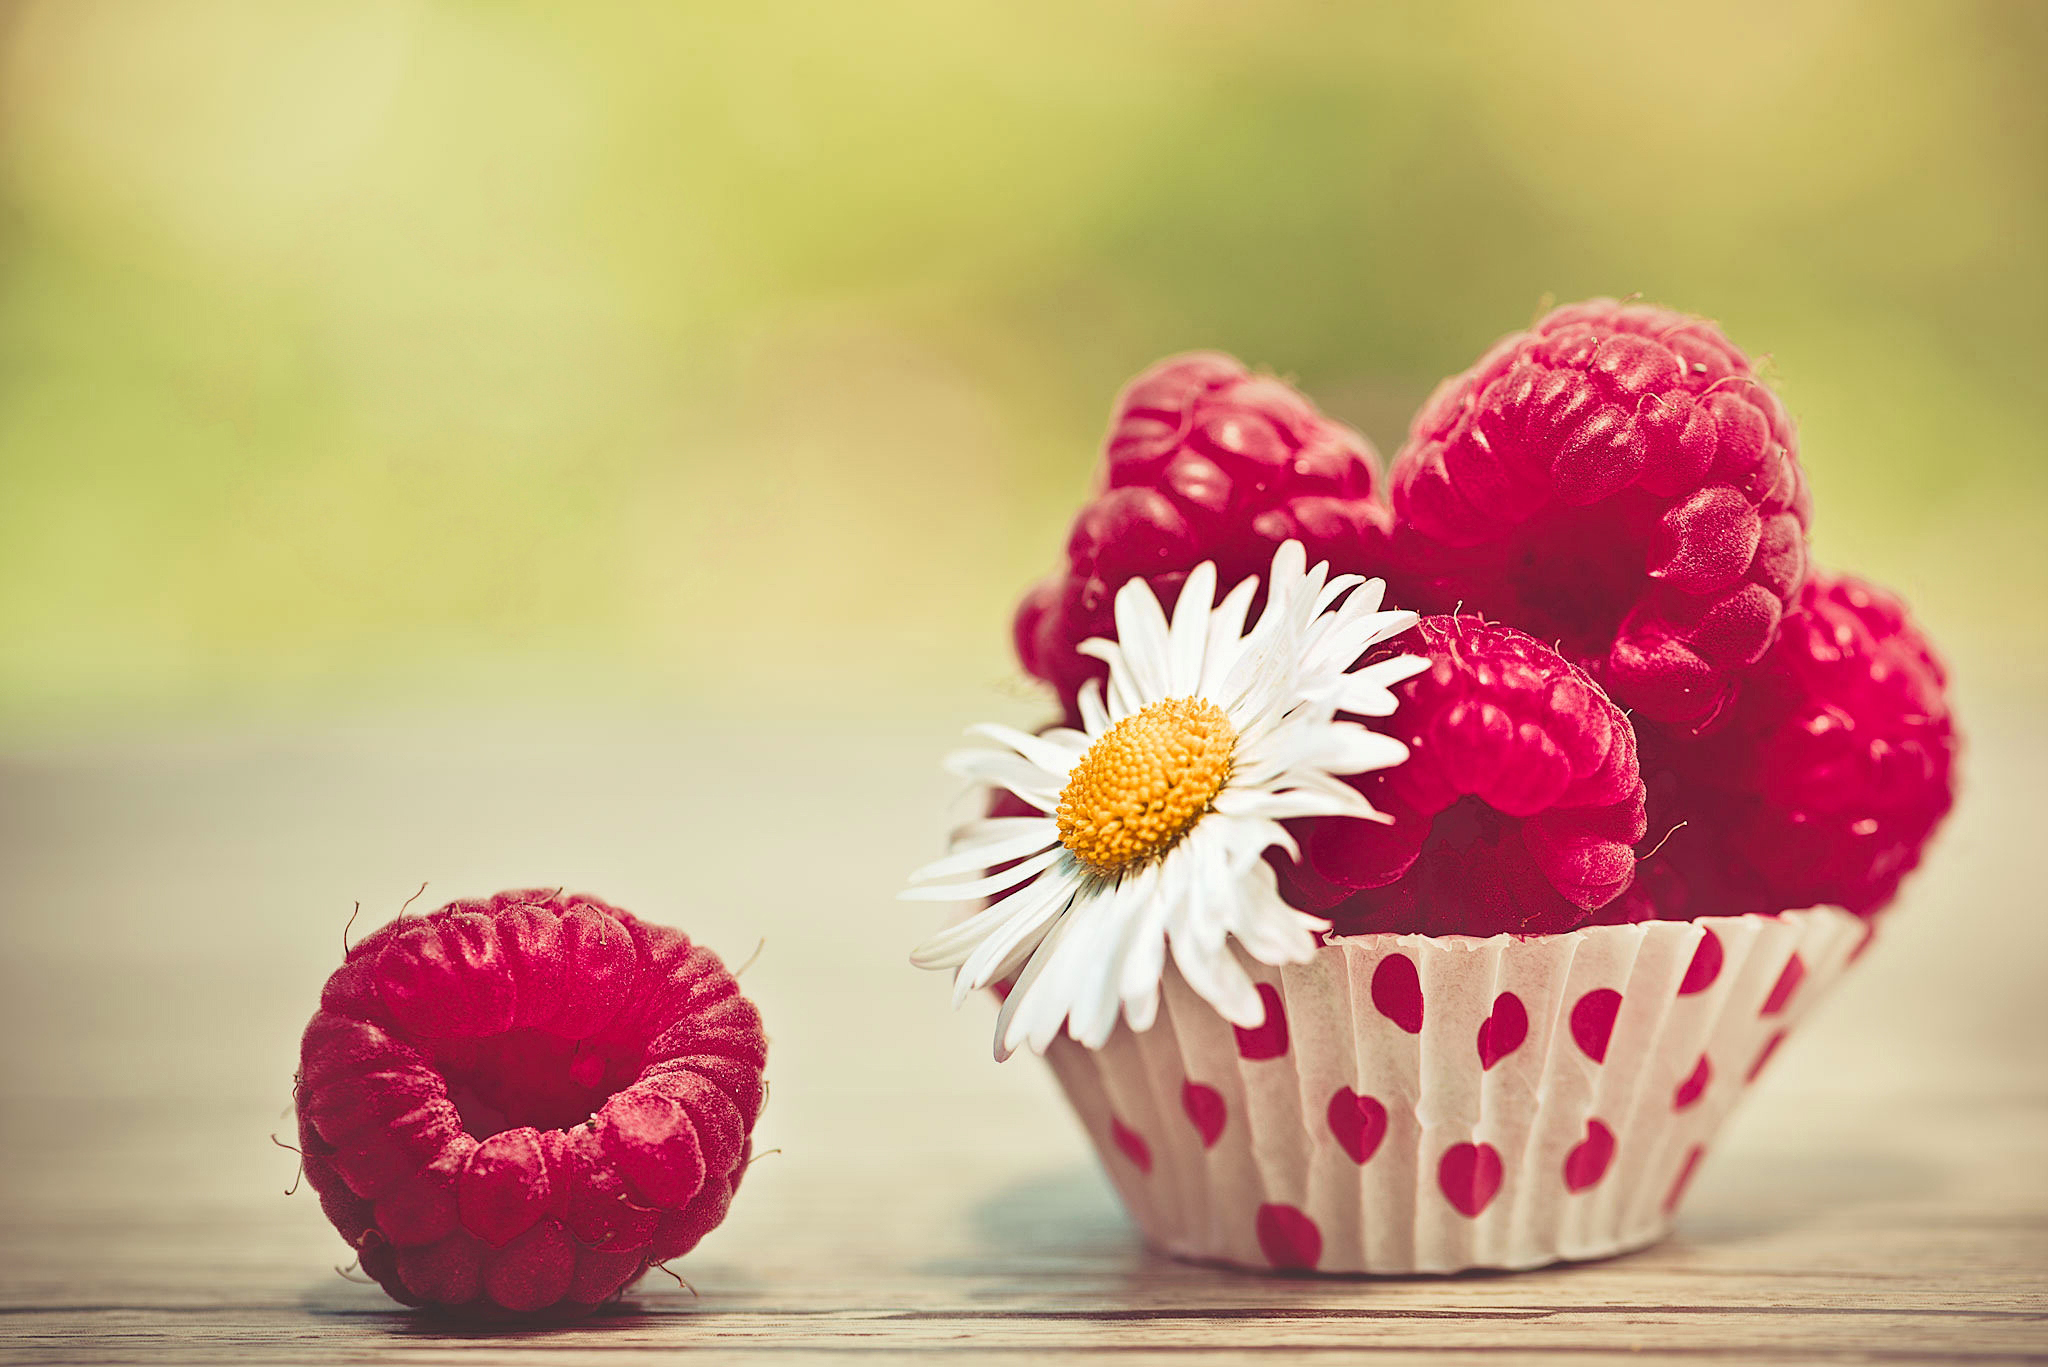 Berry Close Up Fruit Raspberry 2048x1367